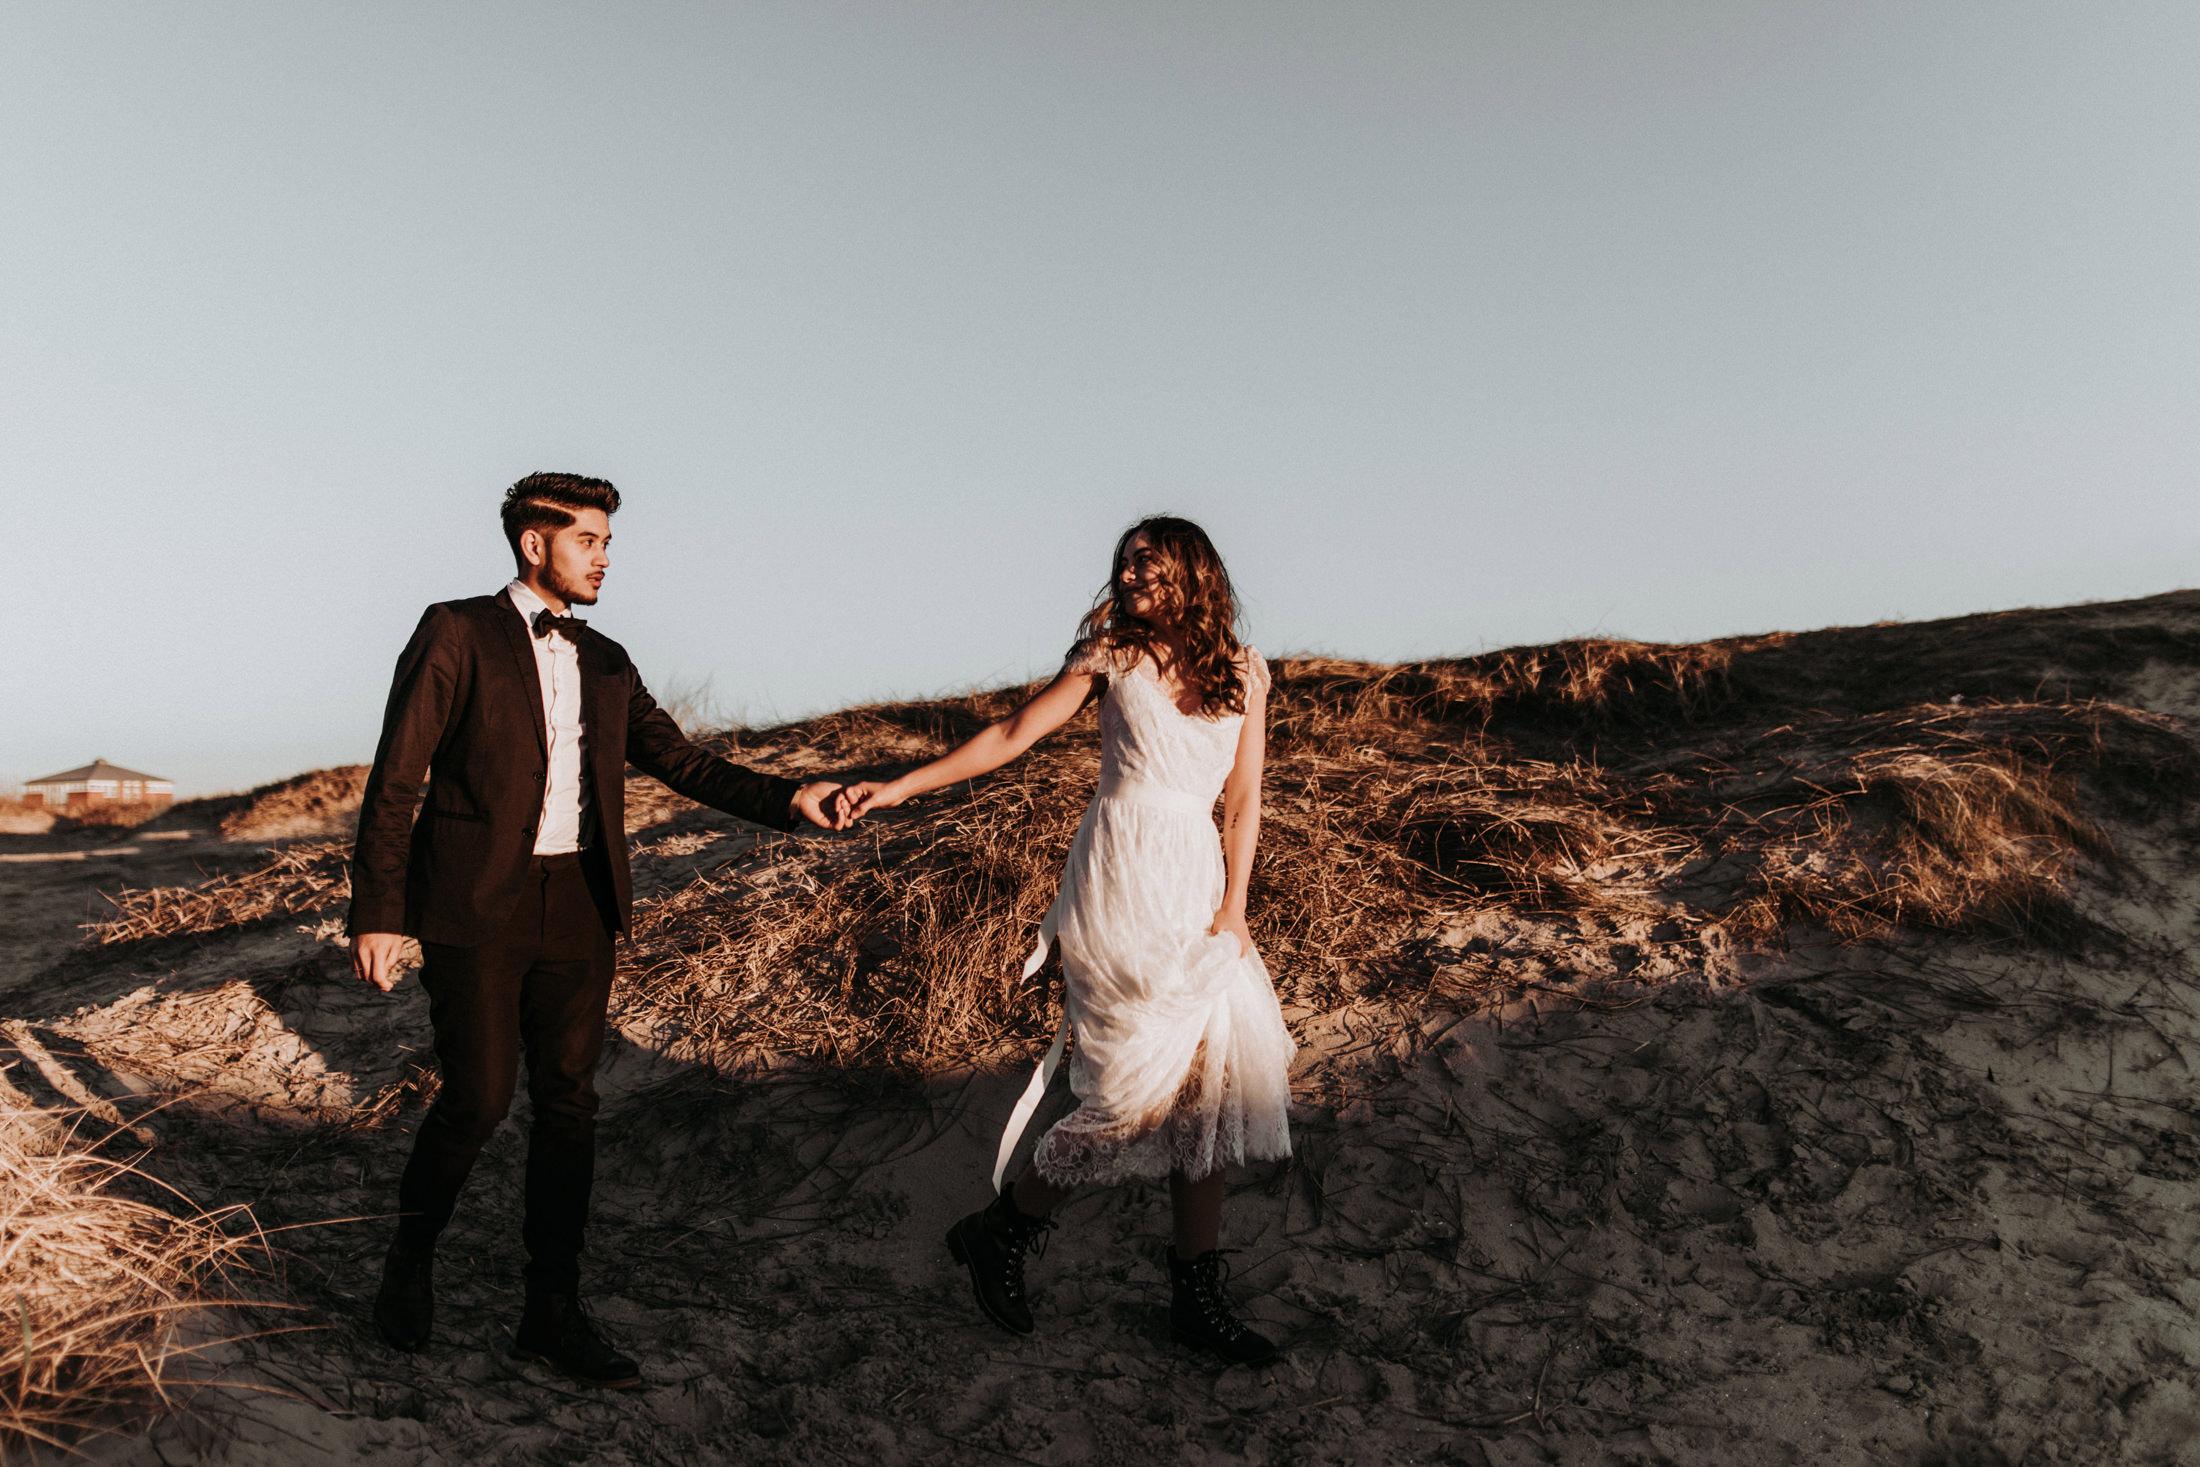 Wedding_Photographer_Mallorca_Daniela-Marquardt_Photography_CanaryIslands_Lanzarote_Iceland_Tuskany_Santorini_Portugal_Schweiz_Austria_Bayern_Elopement_Hochzeitsfotograf_Norddeichich_37